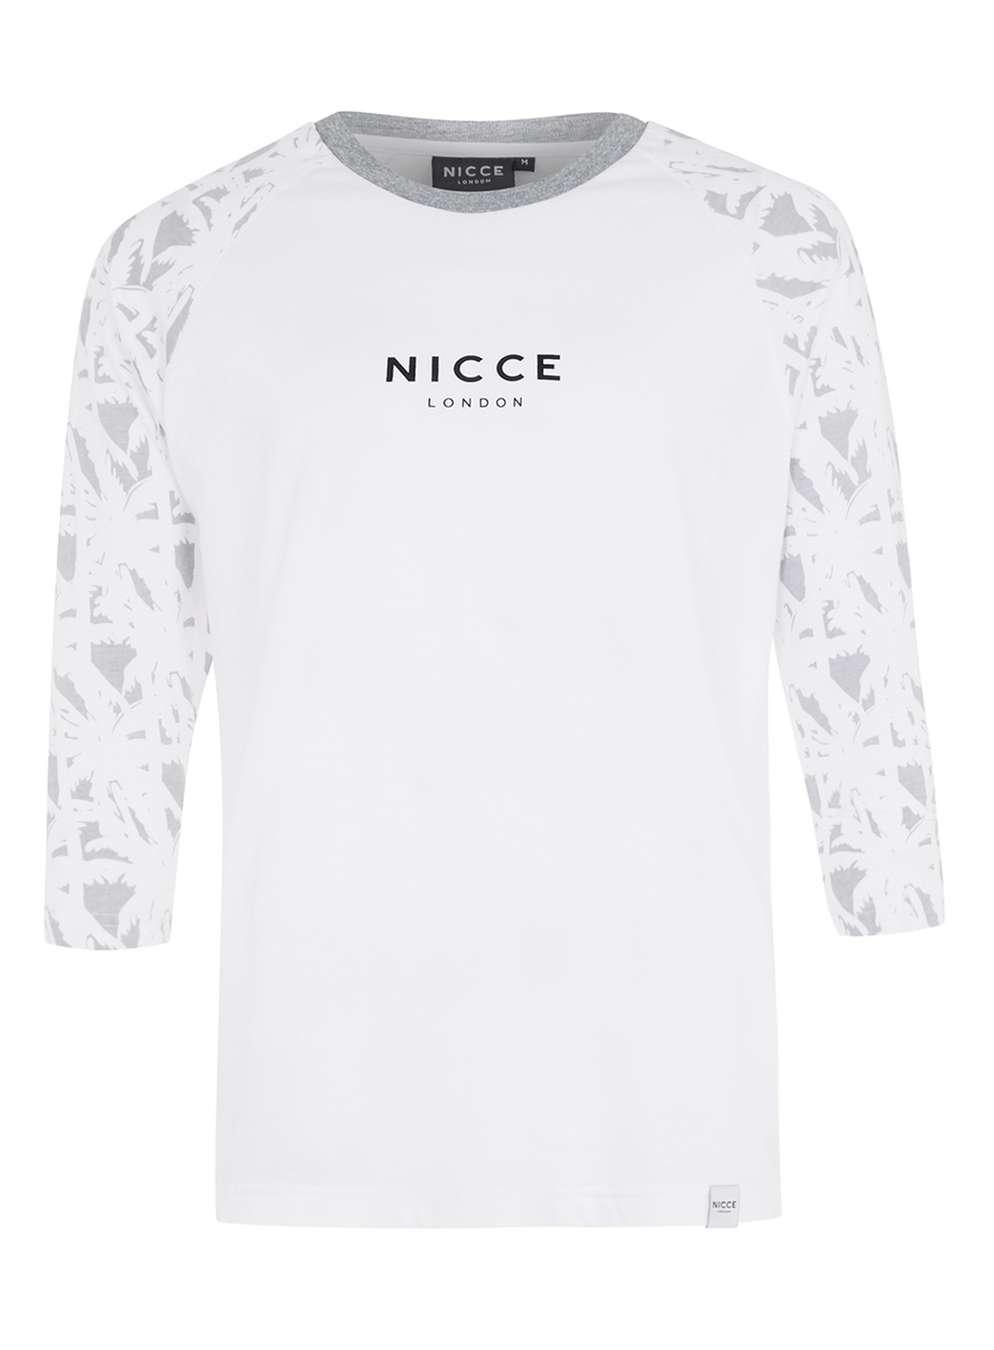 Topman nicce white raglan three quarter length sleeve t for Three quarter length shirt